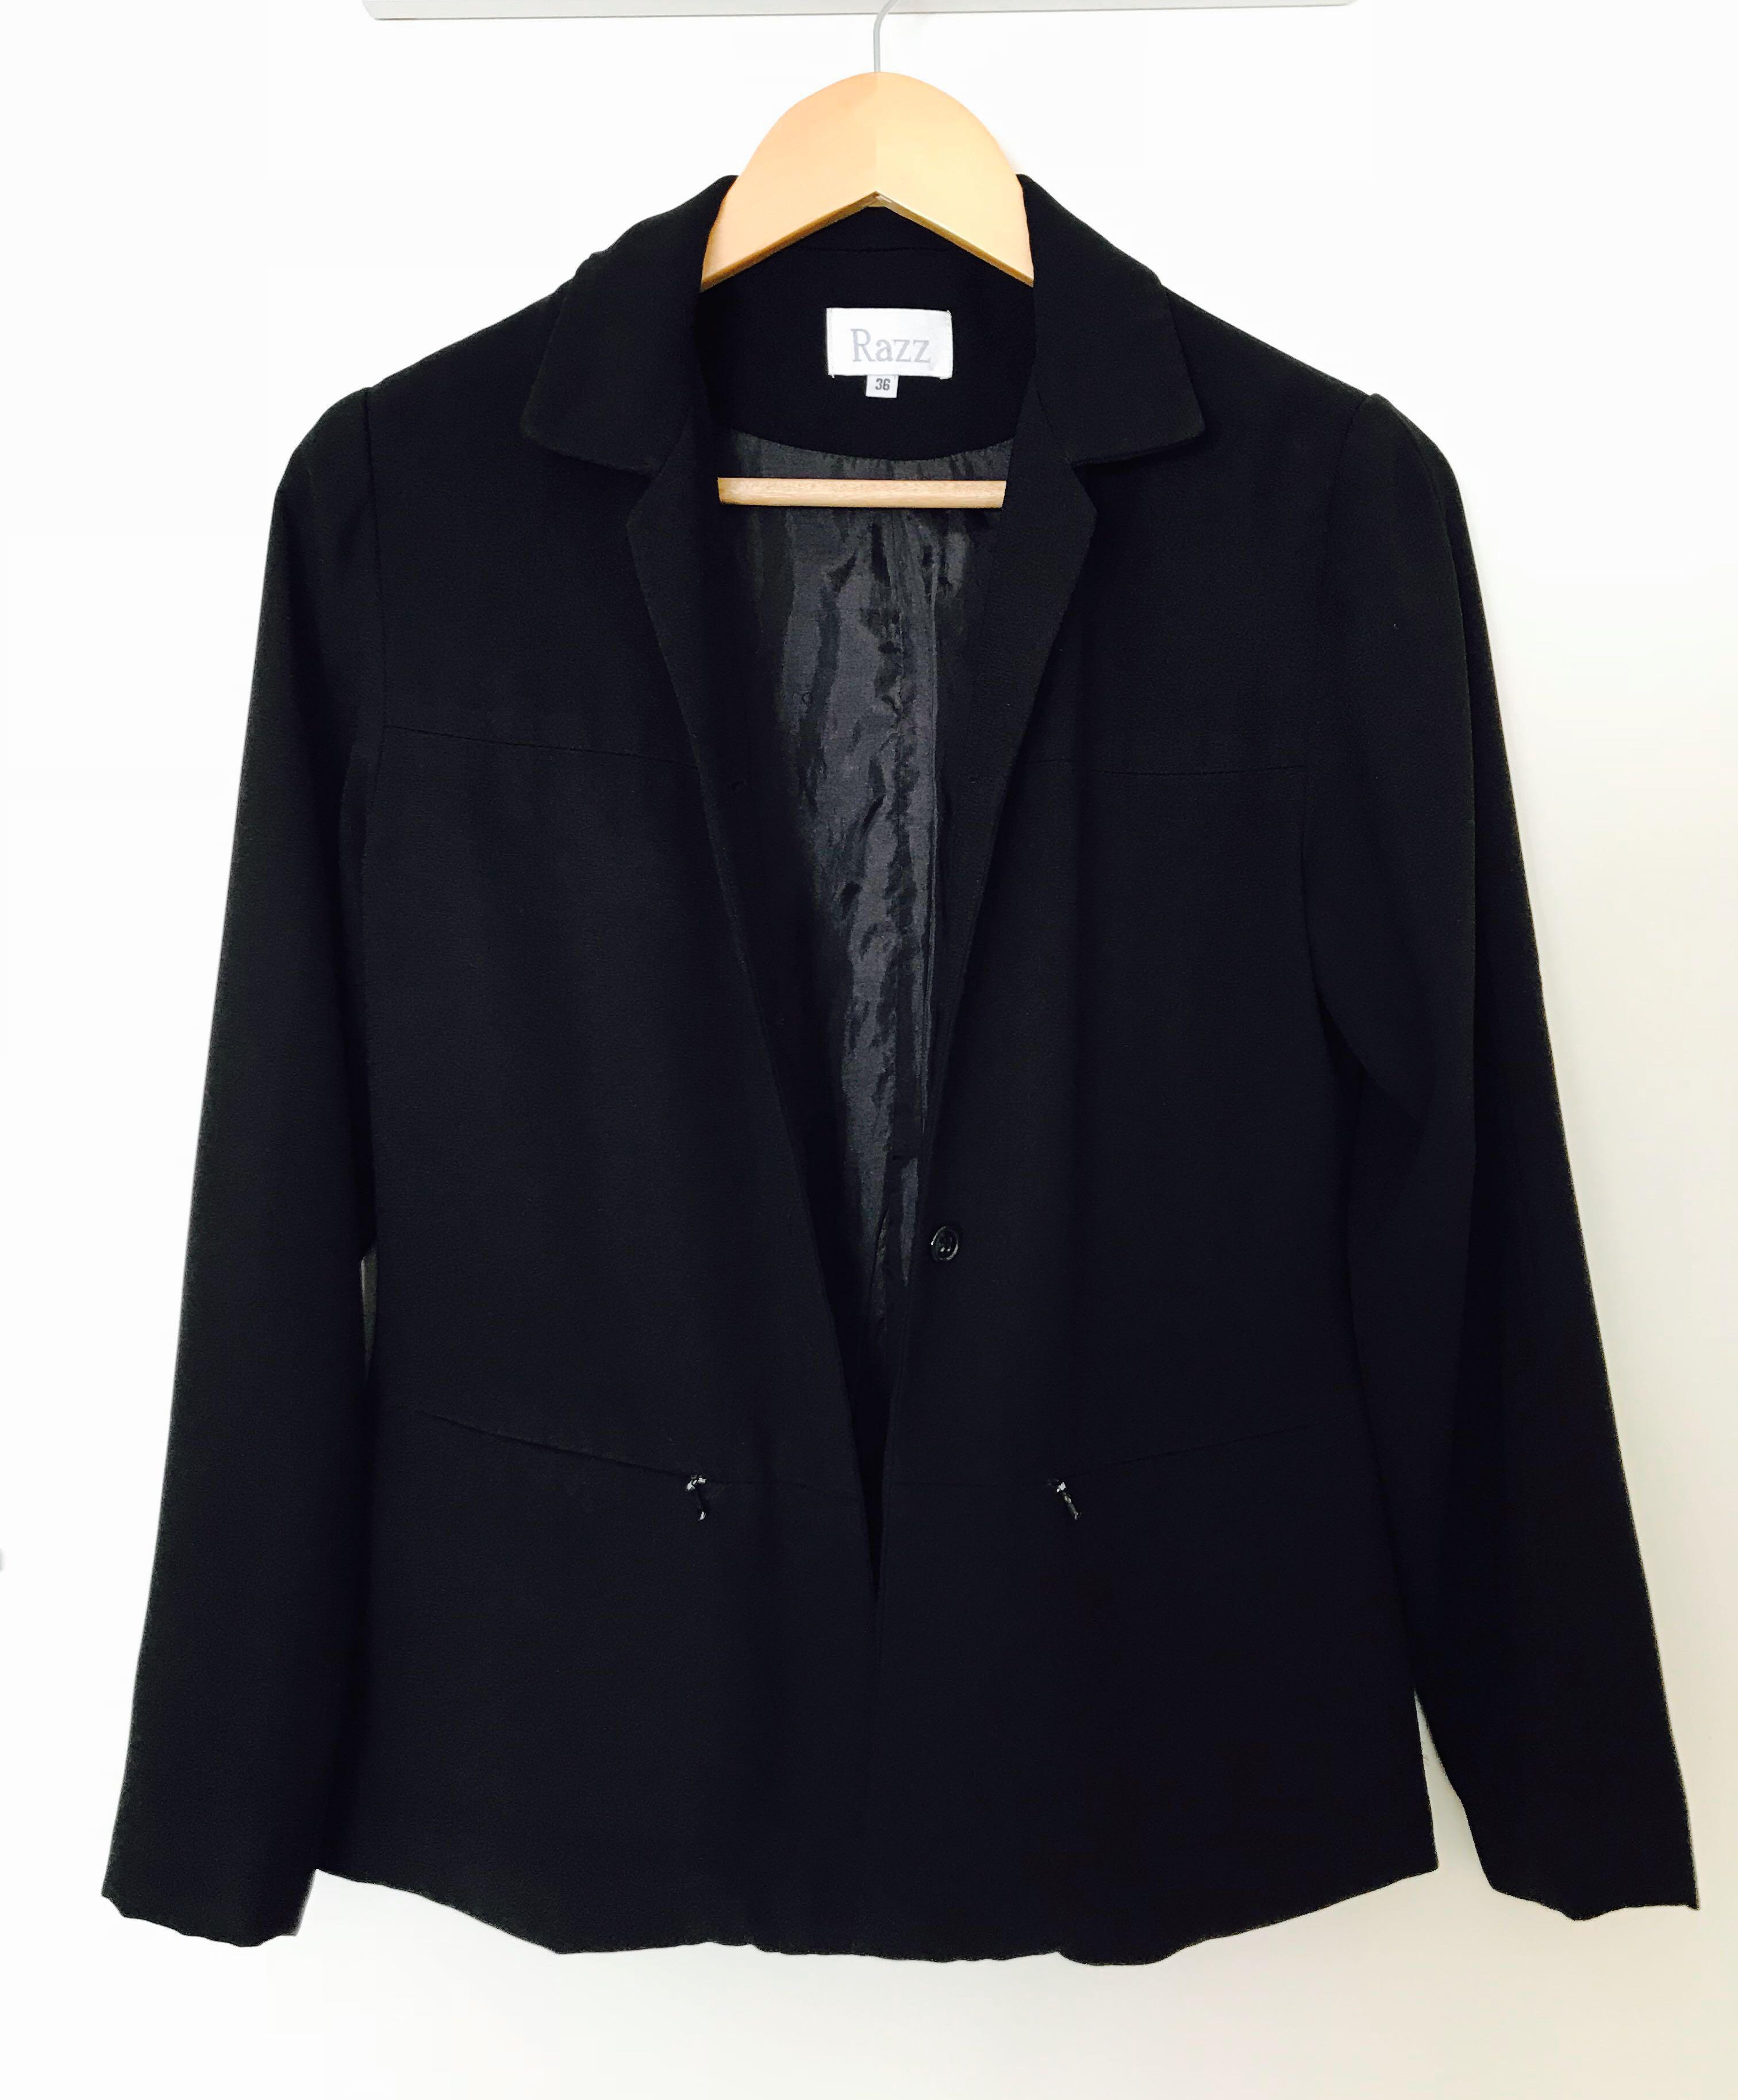 Black women's blazer / coat / jacket